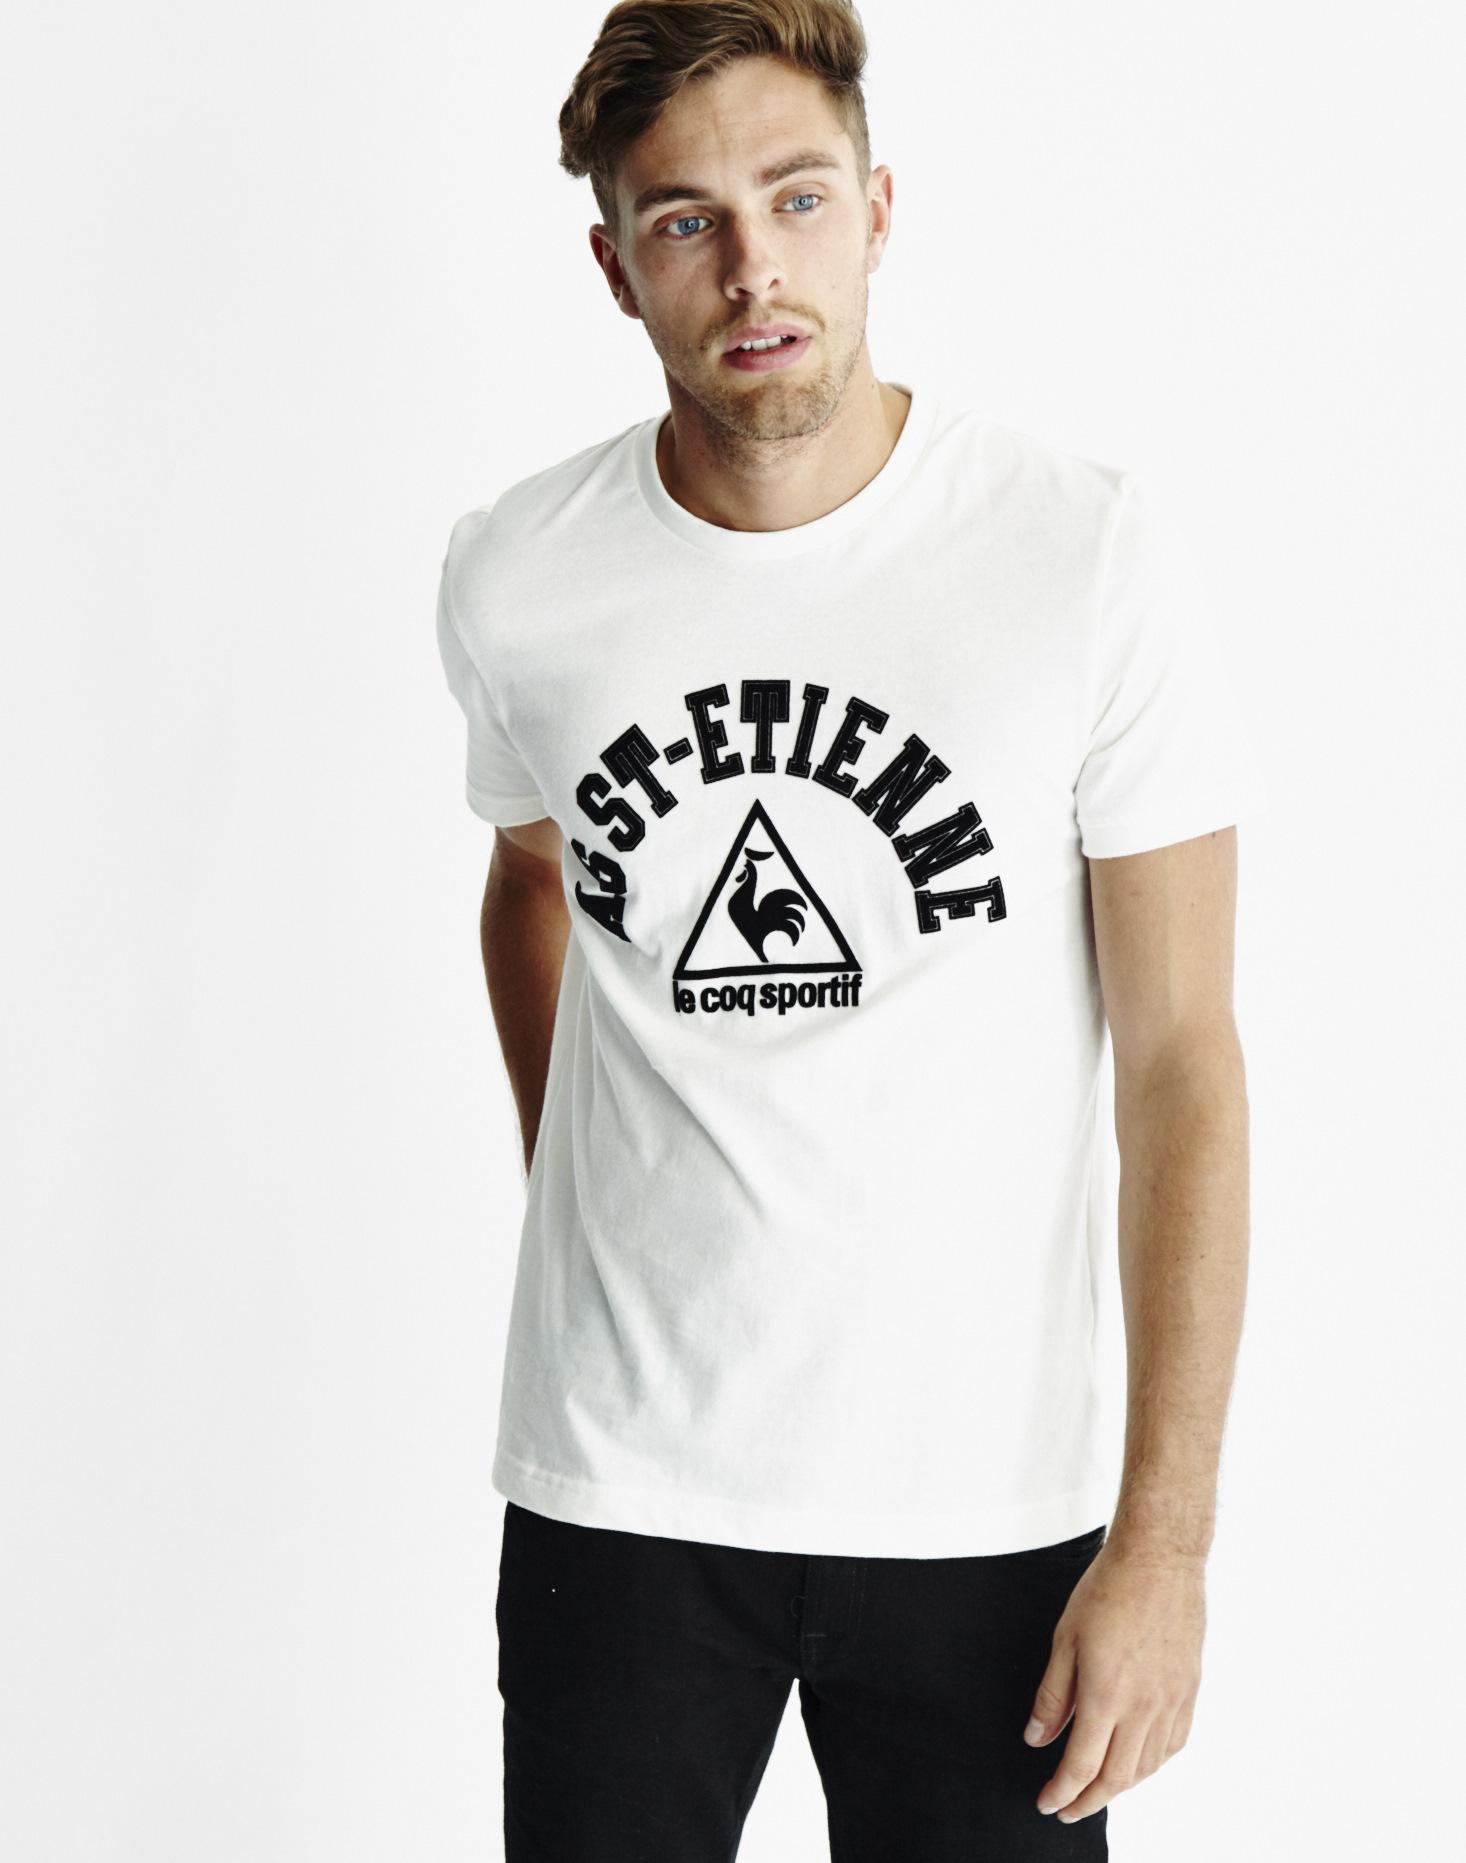 le coq sportif shirt - photo #47